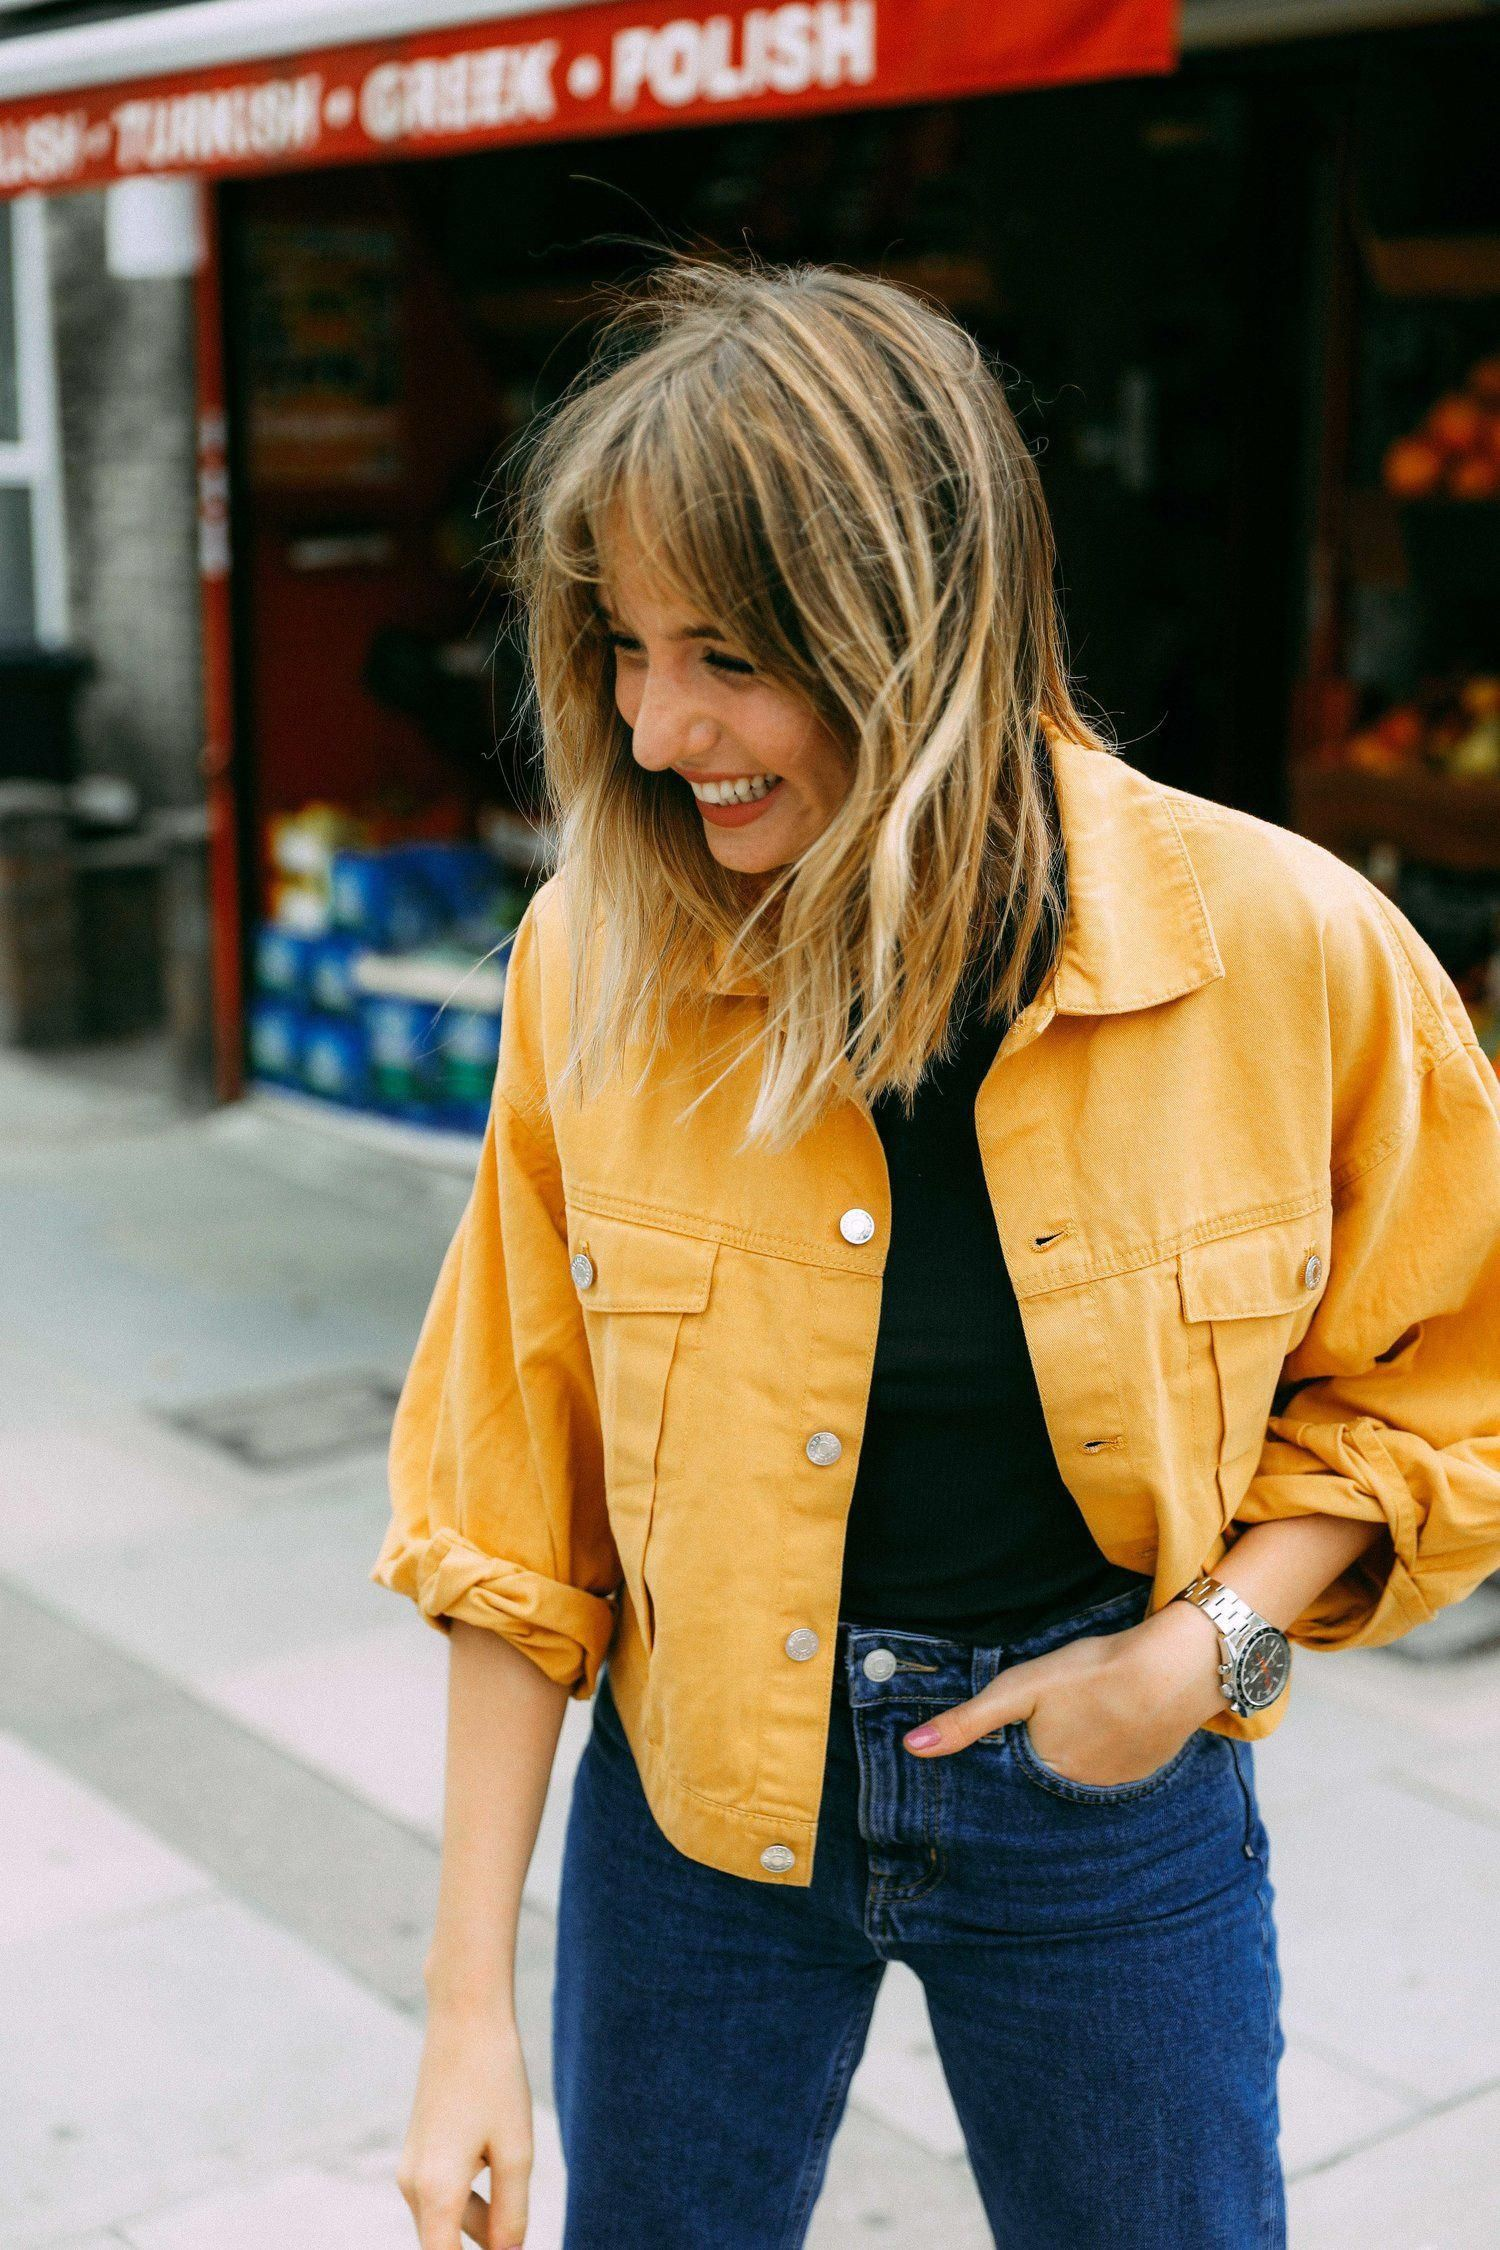 Denim Jacket Outfits Springoutfitswomen Transition Outfits Yellow Denim Jean Jacket Outfits [ 2250 x 1500 Pixel ]